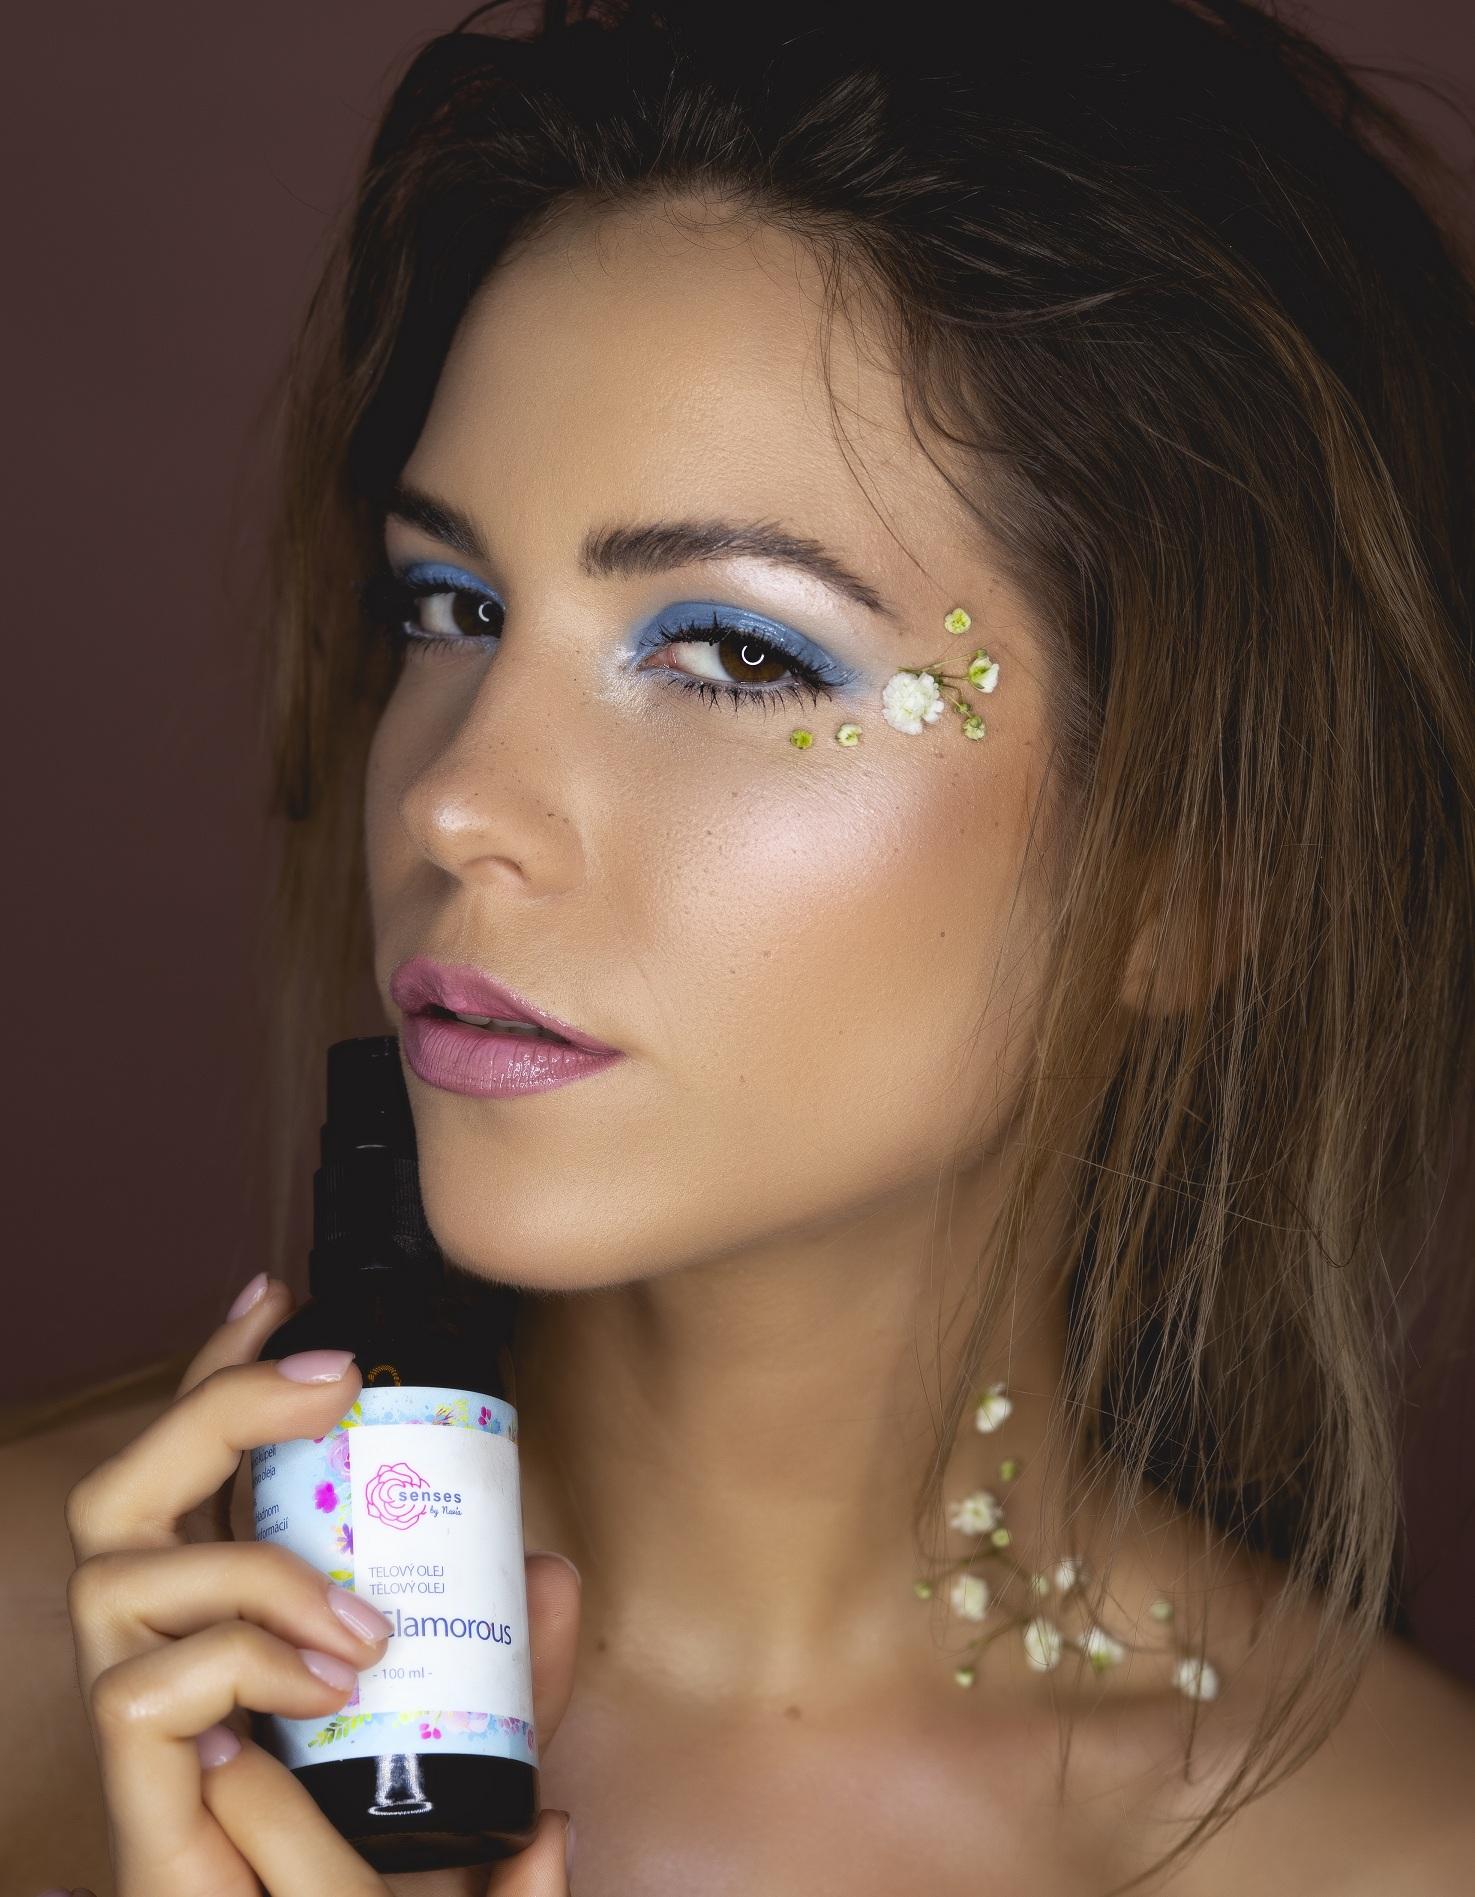 glamorous-olej-telovy-vegan-prirodni-kosmetika